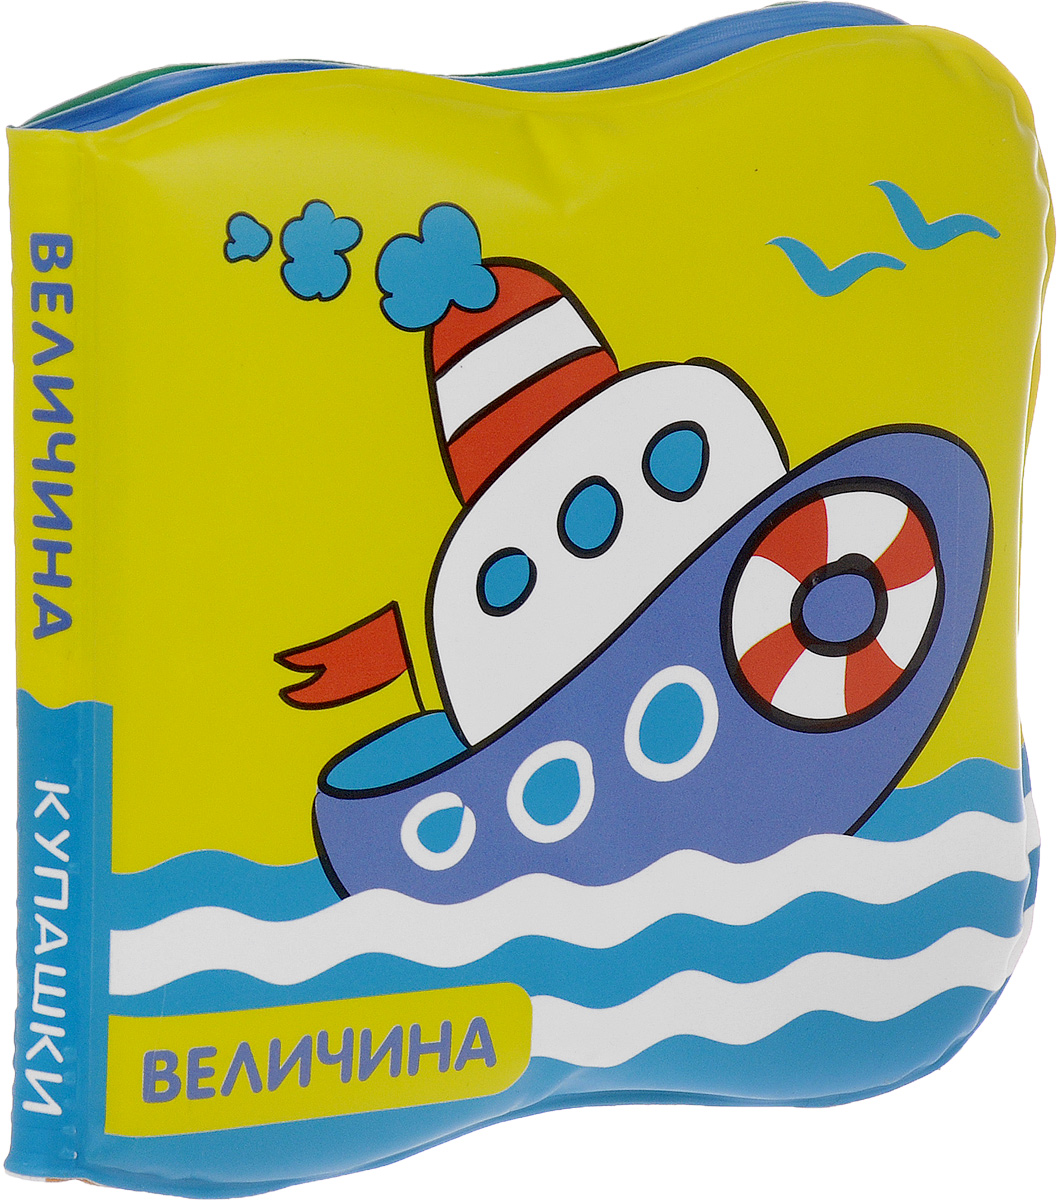 Мозаика-Синтез Книжка-игрушка Кораблик Величина разноцветная мозаика кораблик 2604